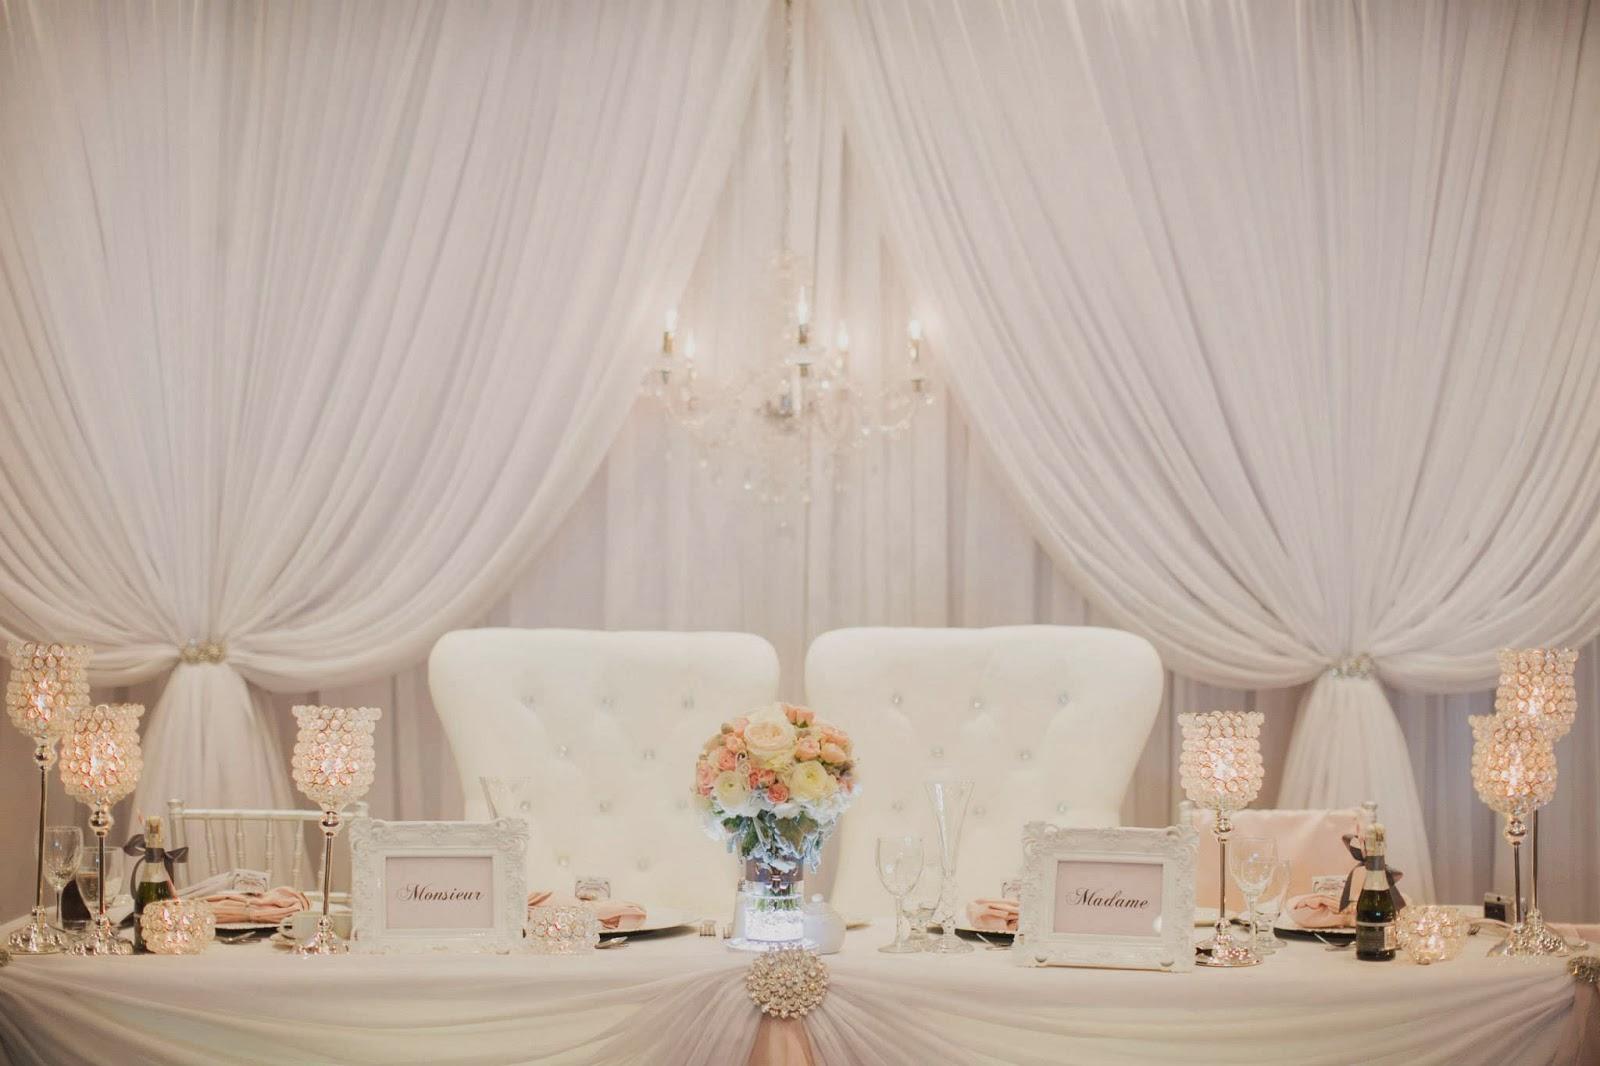 gala decor elizabeth in love casablanca winery inn grimsby wedding photos, kj and co wedding burlington ontario planner